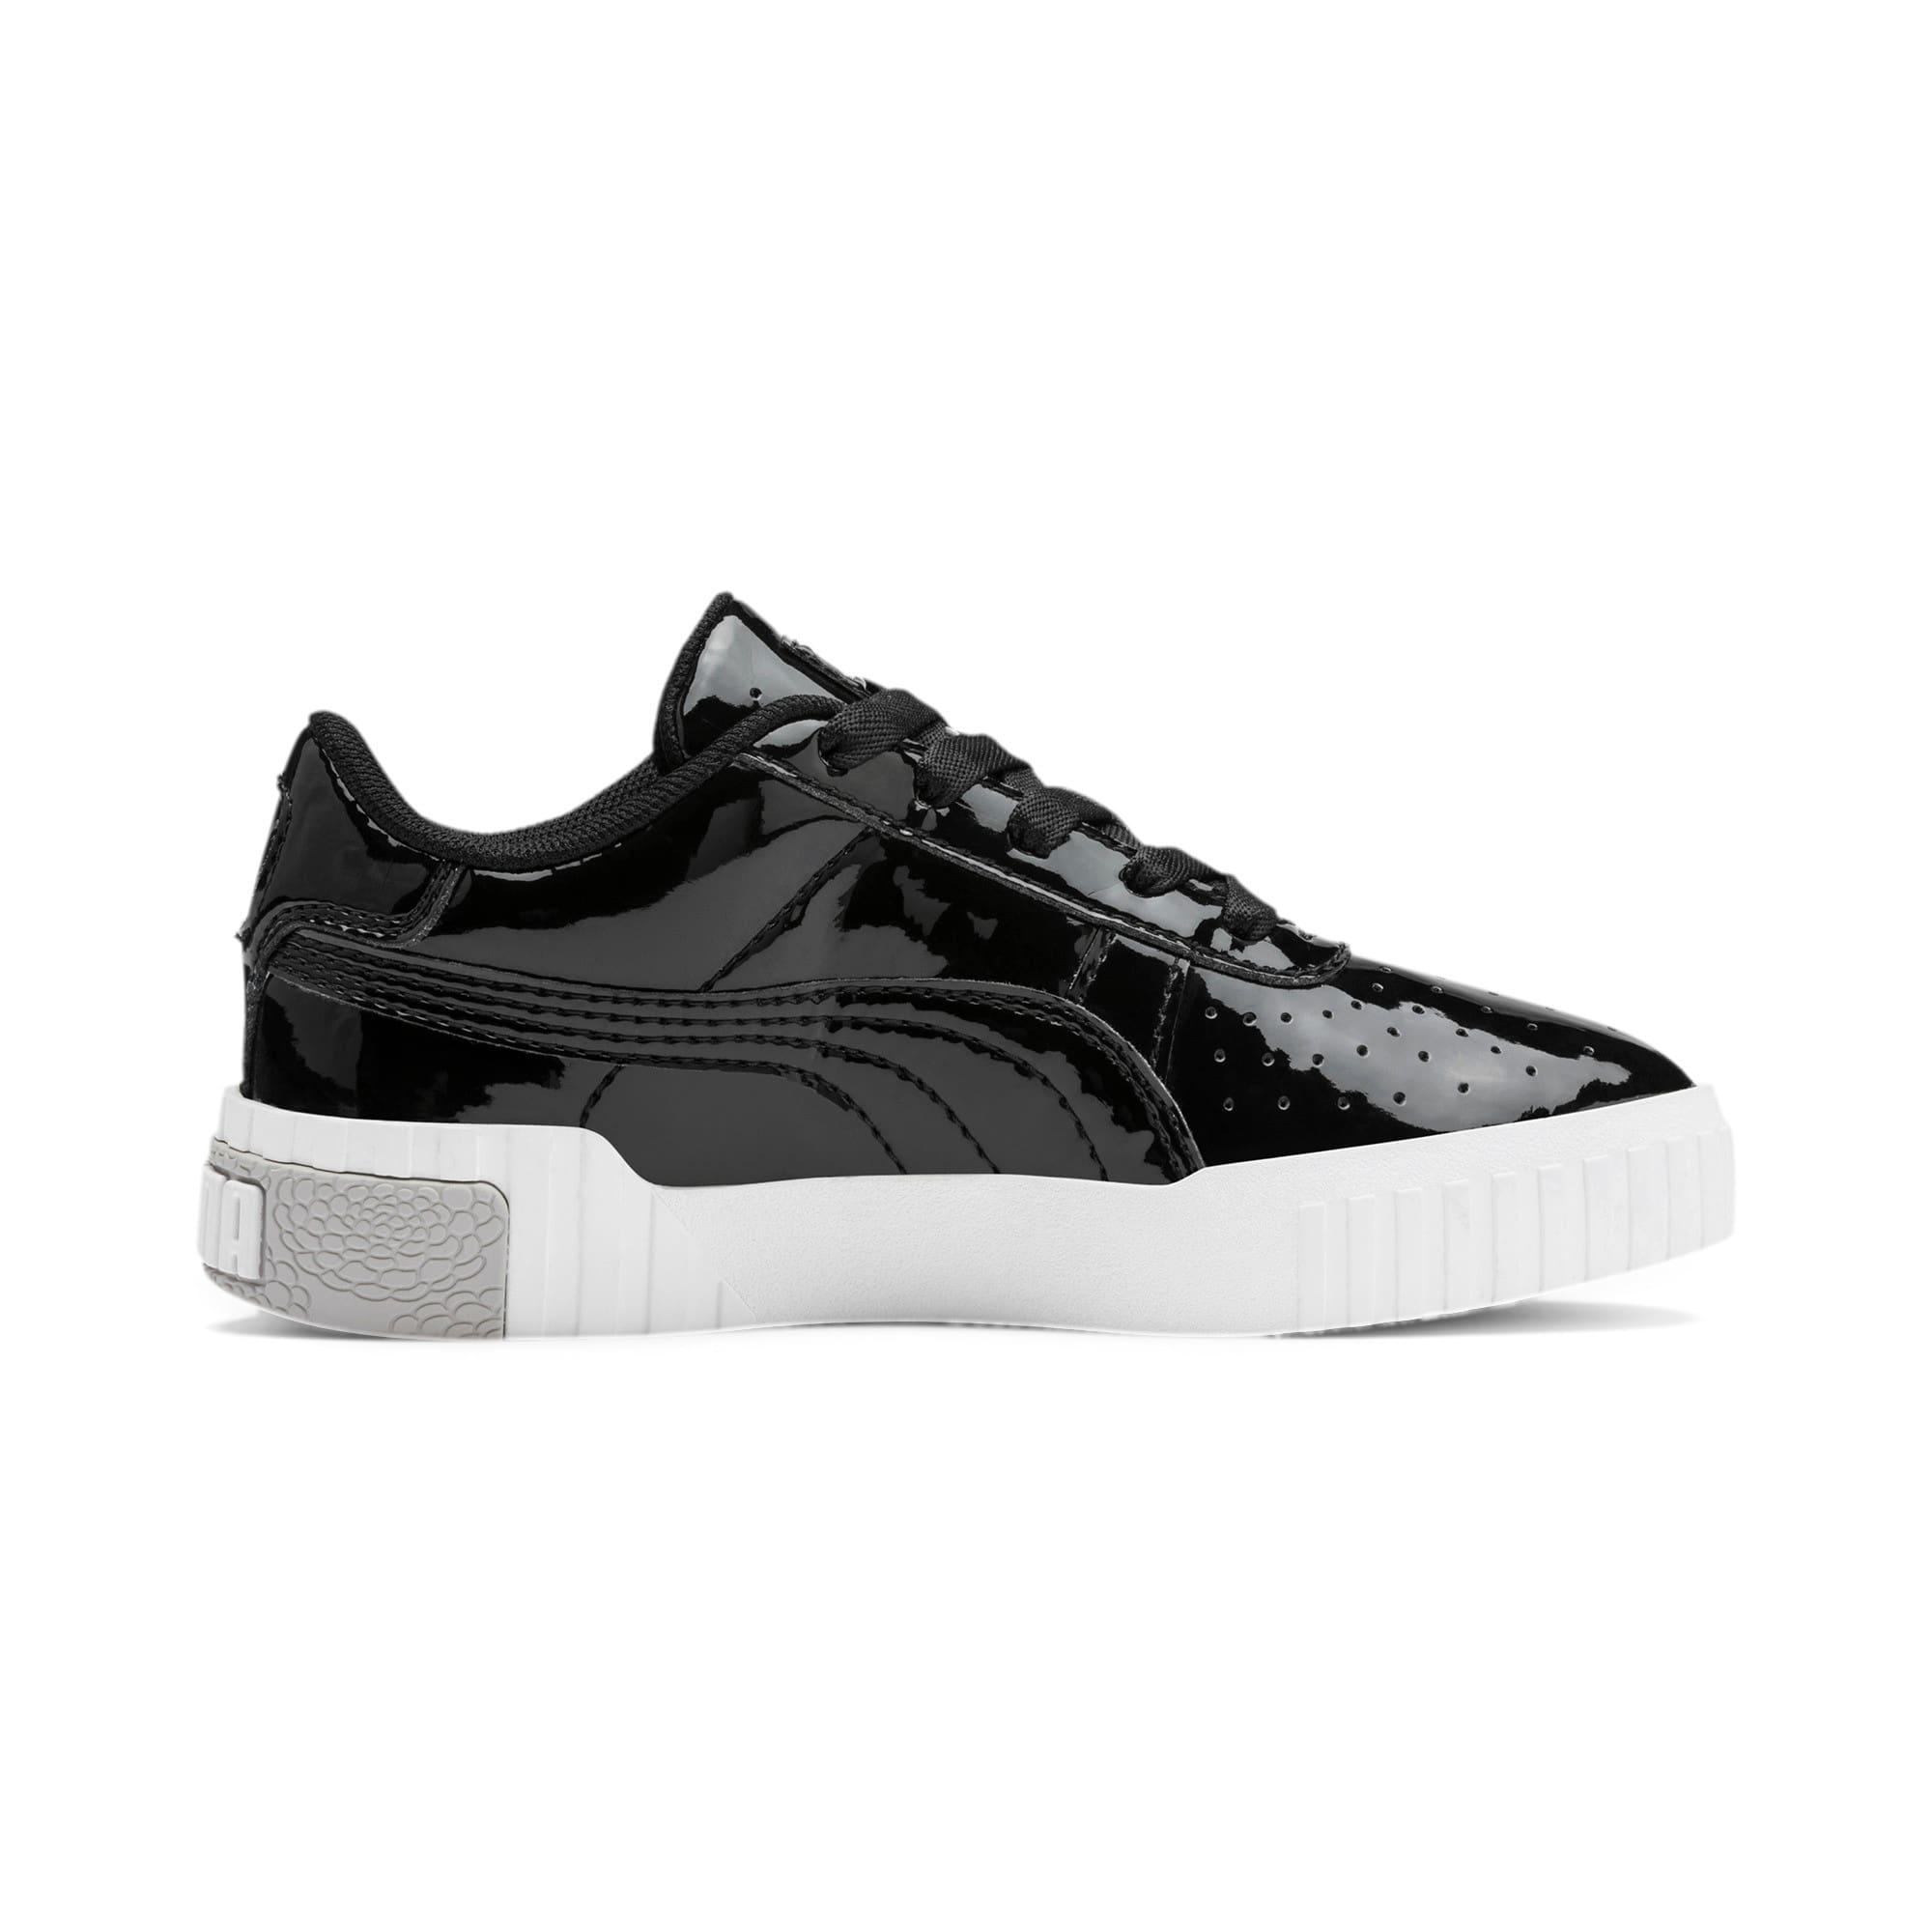 Thumbnail 5 of Cali Patent Kids' Trainers, Puma Black-Puma White, medium